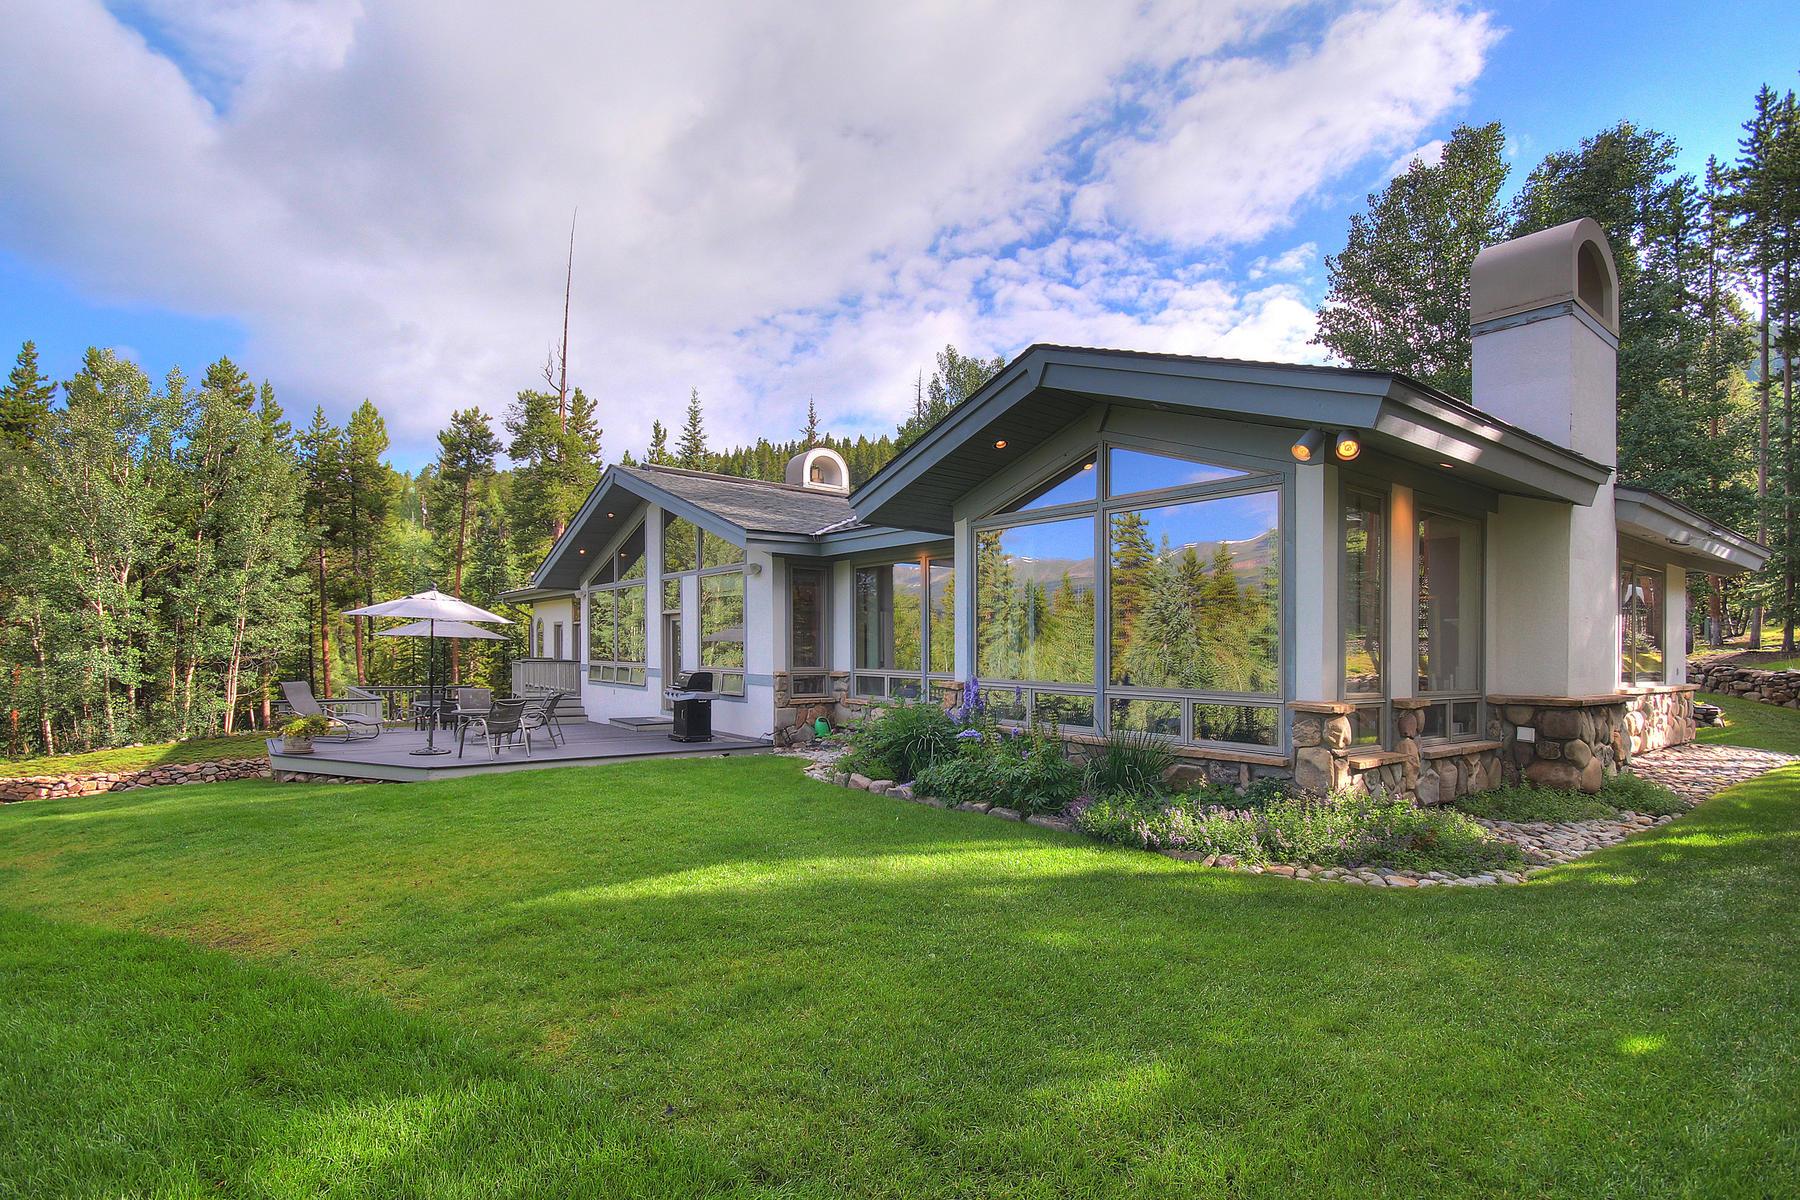 独户住宅 为 销售 在 Home with Majestic Ski Mountain Views on 2+ Acres in Town 1031 Boreas Pass Road 布雷肯里奇, 科罗拉多州, 80424 美国